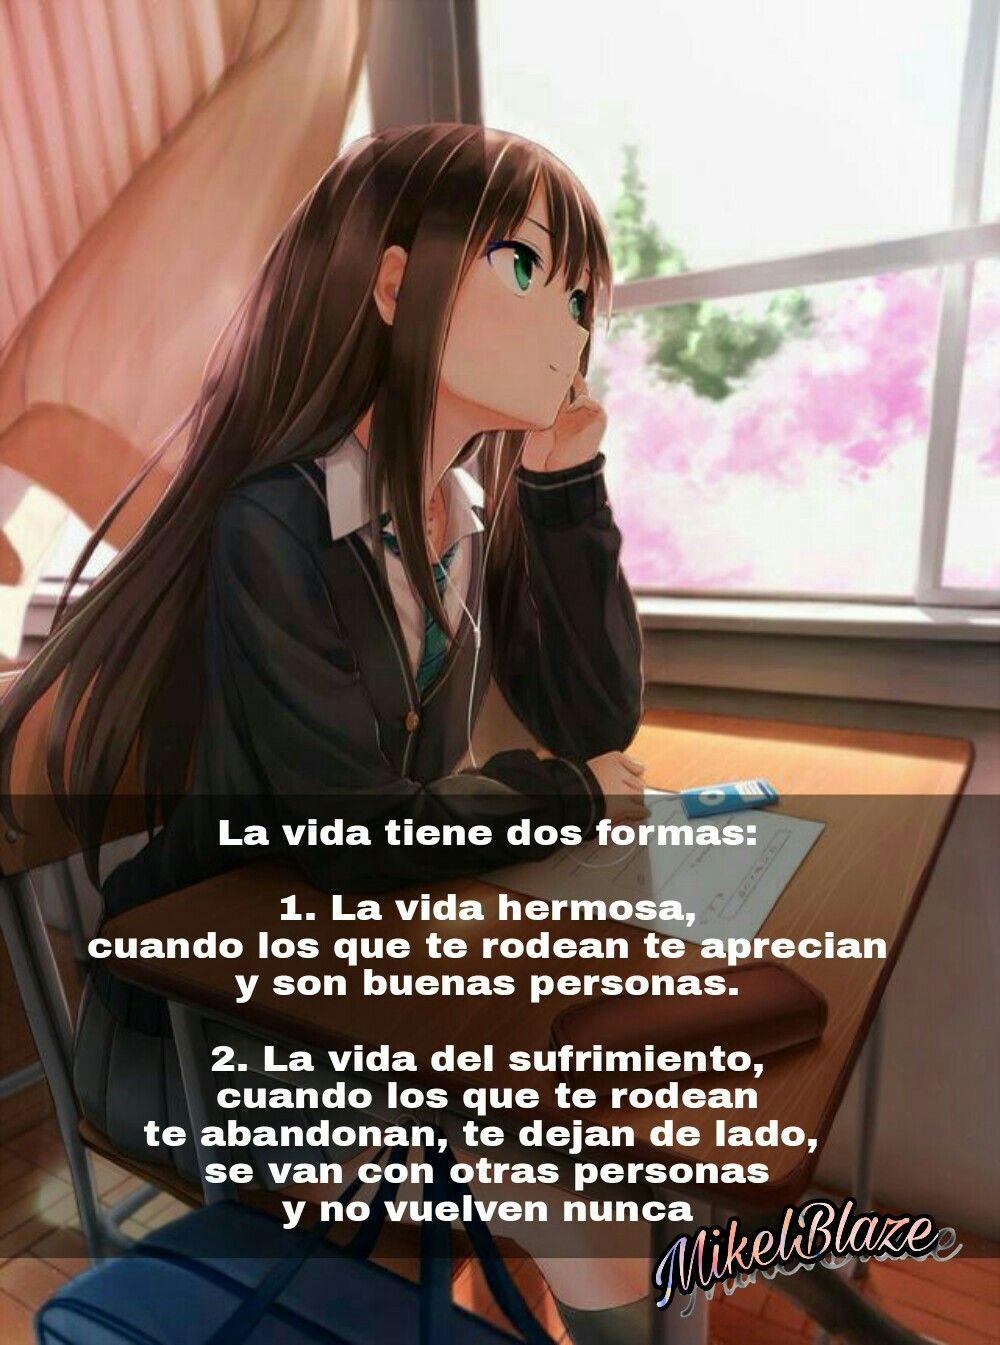 frases hermosas de anime: Frases Anime, La Vida, Vida Hermosa, Vida Del Sufrimiento